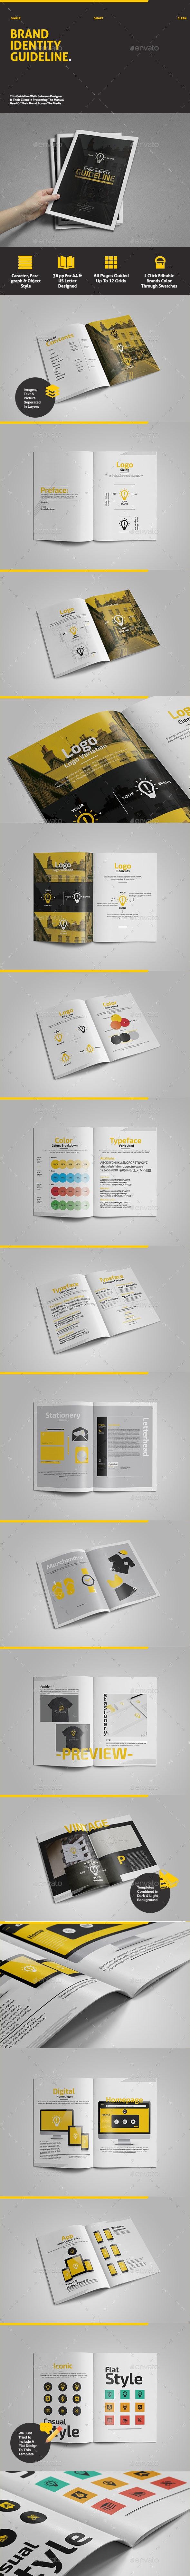 Brand Identity Guideline - Informational Brochures